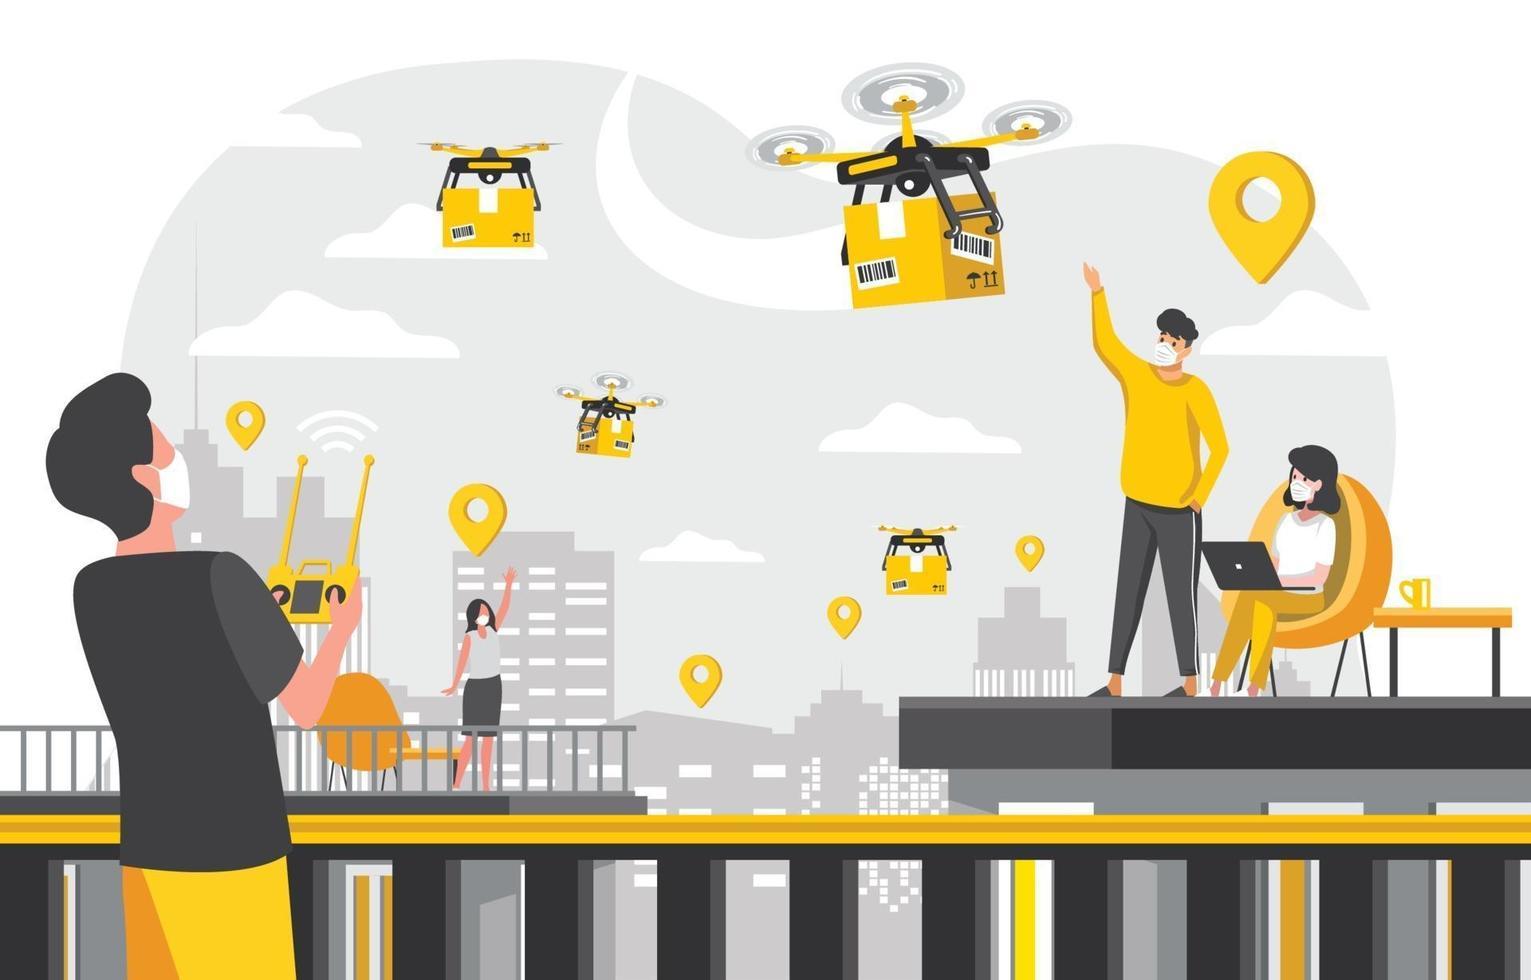 Entrega sin contacto sin contacto con concepto de drone vector